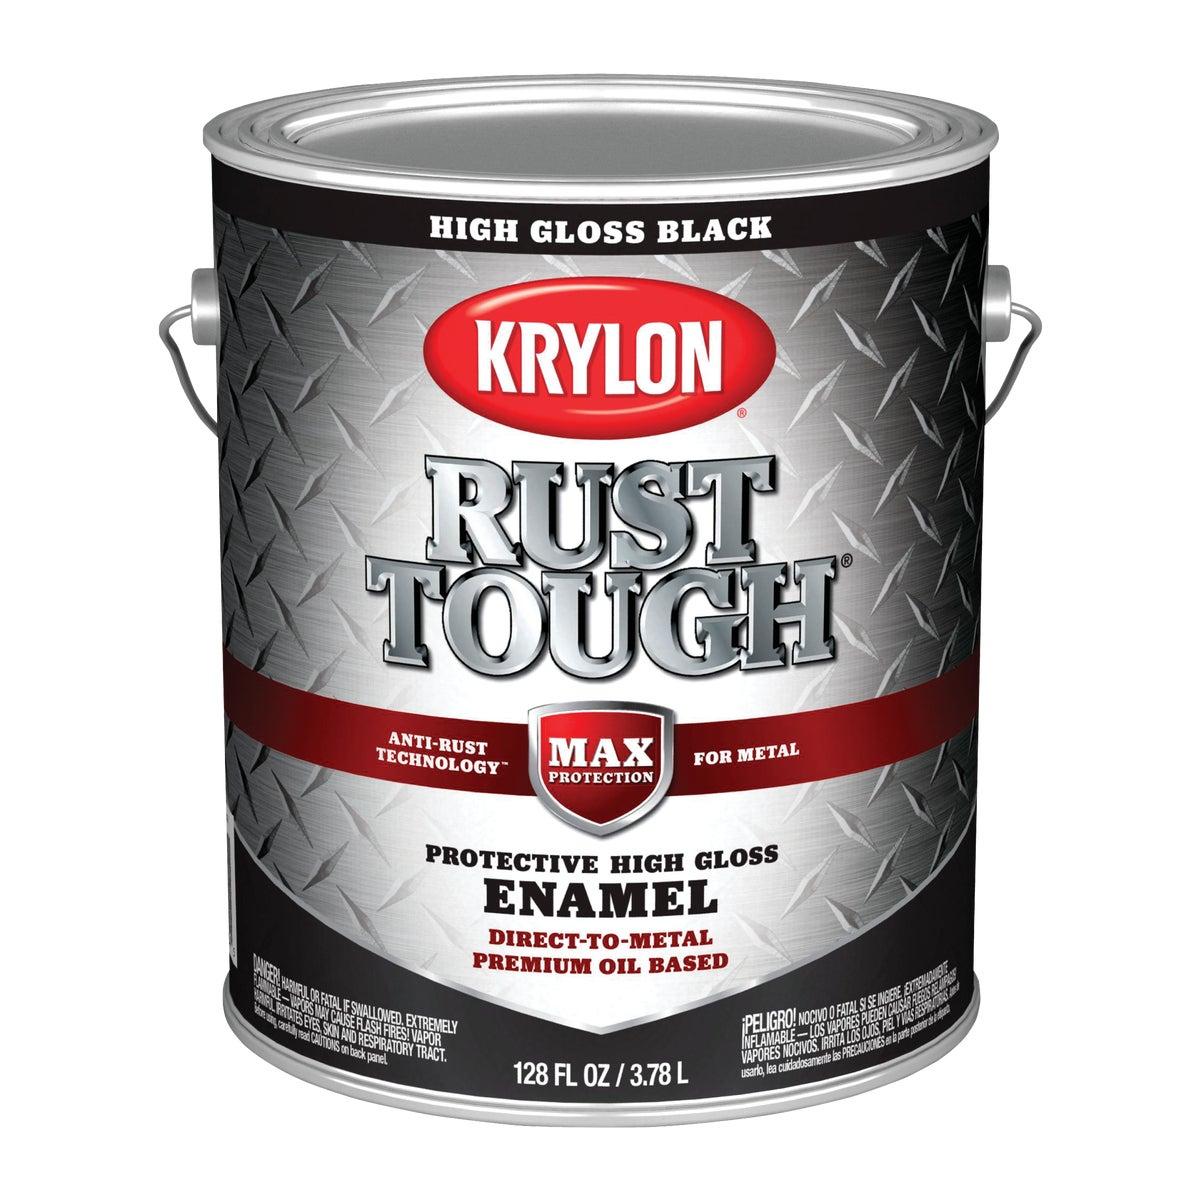 GLOSS BLACK RUST ENAMEL - 044.0021824.007 by Valspar Corp